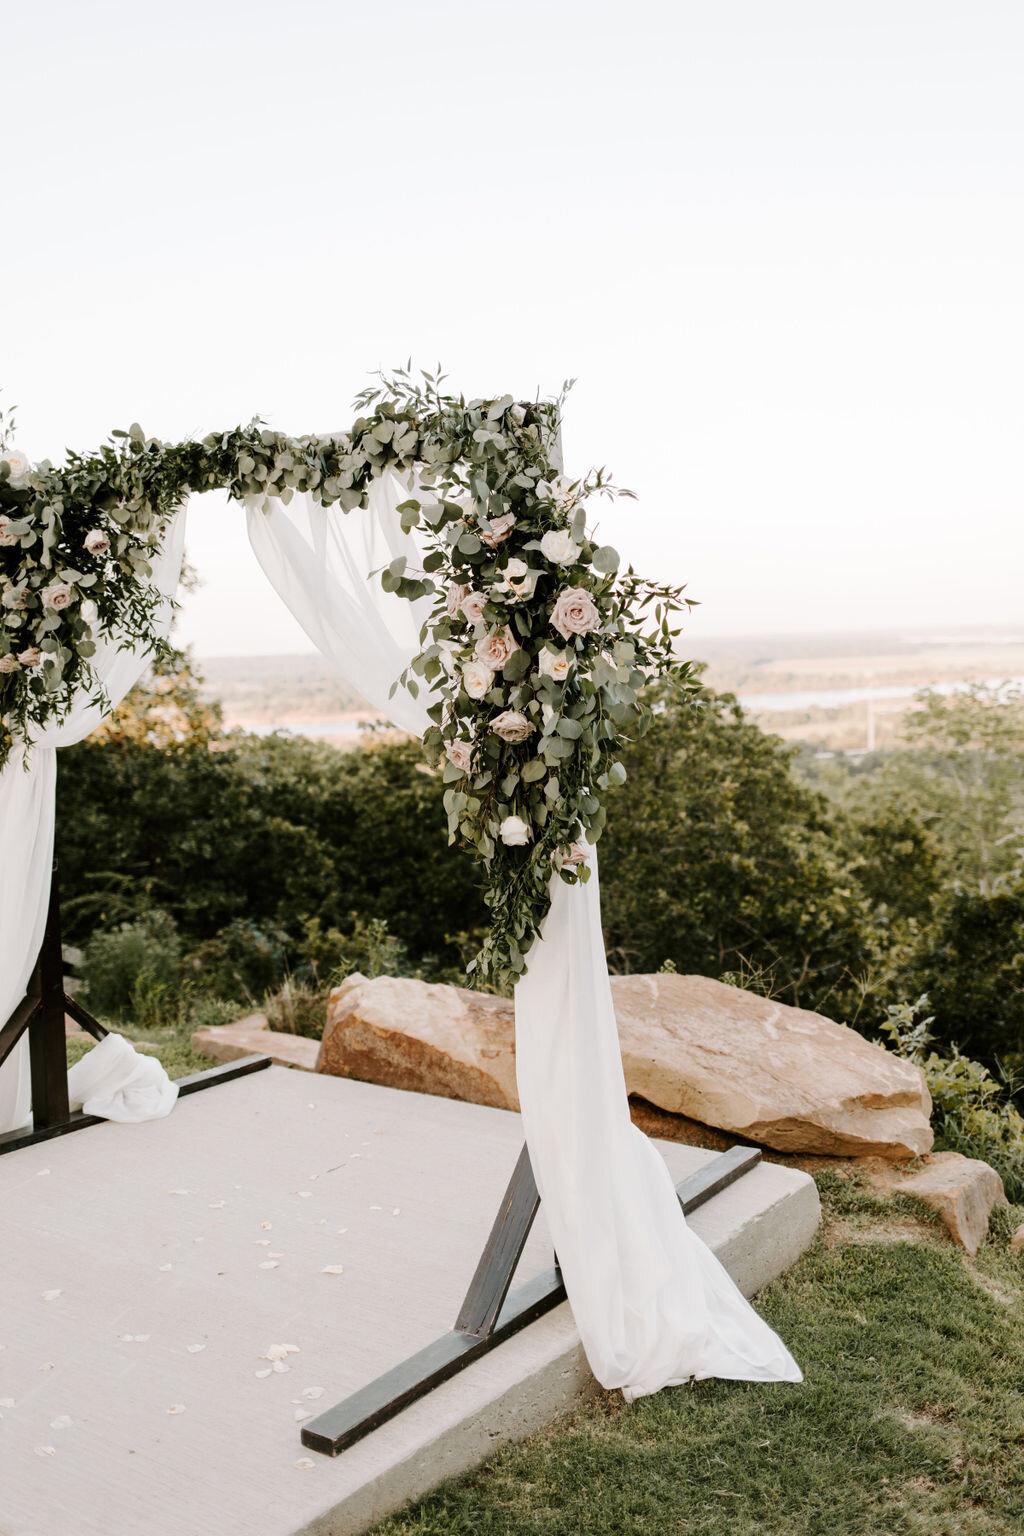 Tulsa White Barn Wedding Venue Outdoor Ceremony 22.JPG